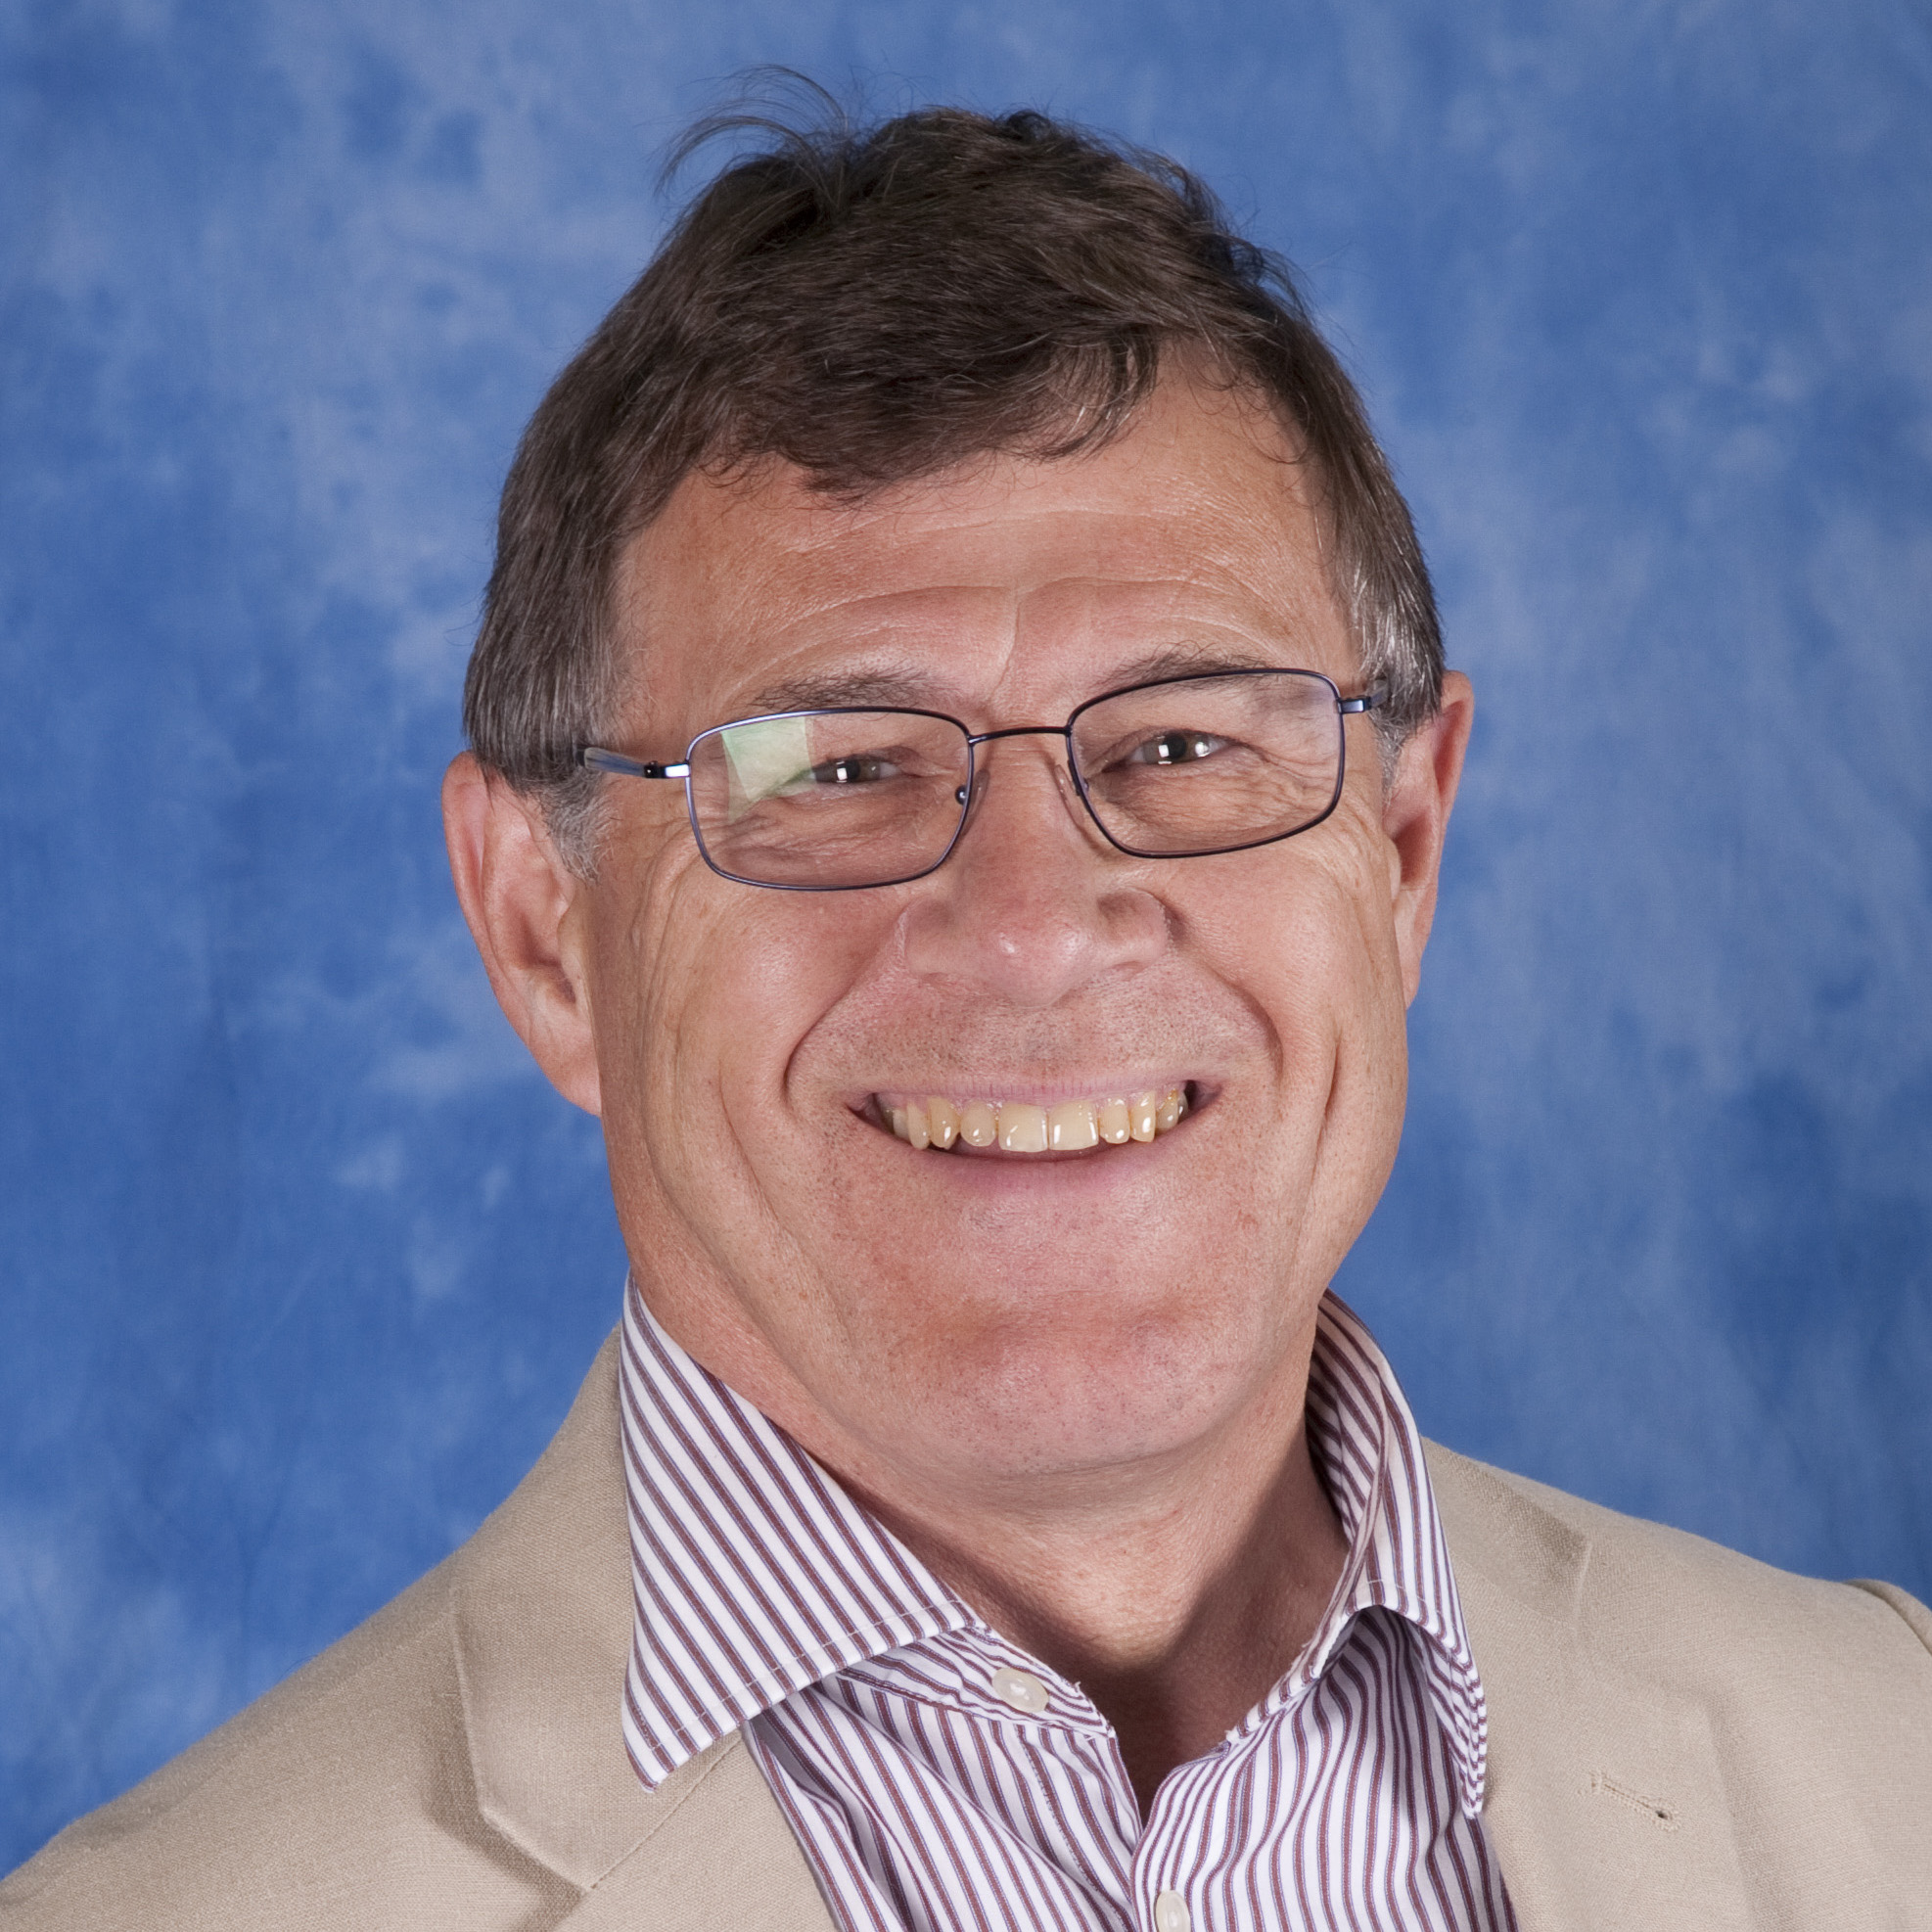 Councillor Kevin Newland